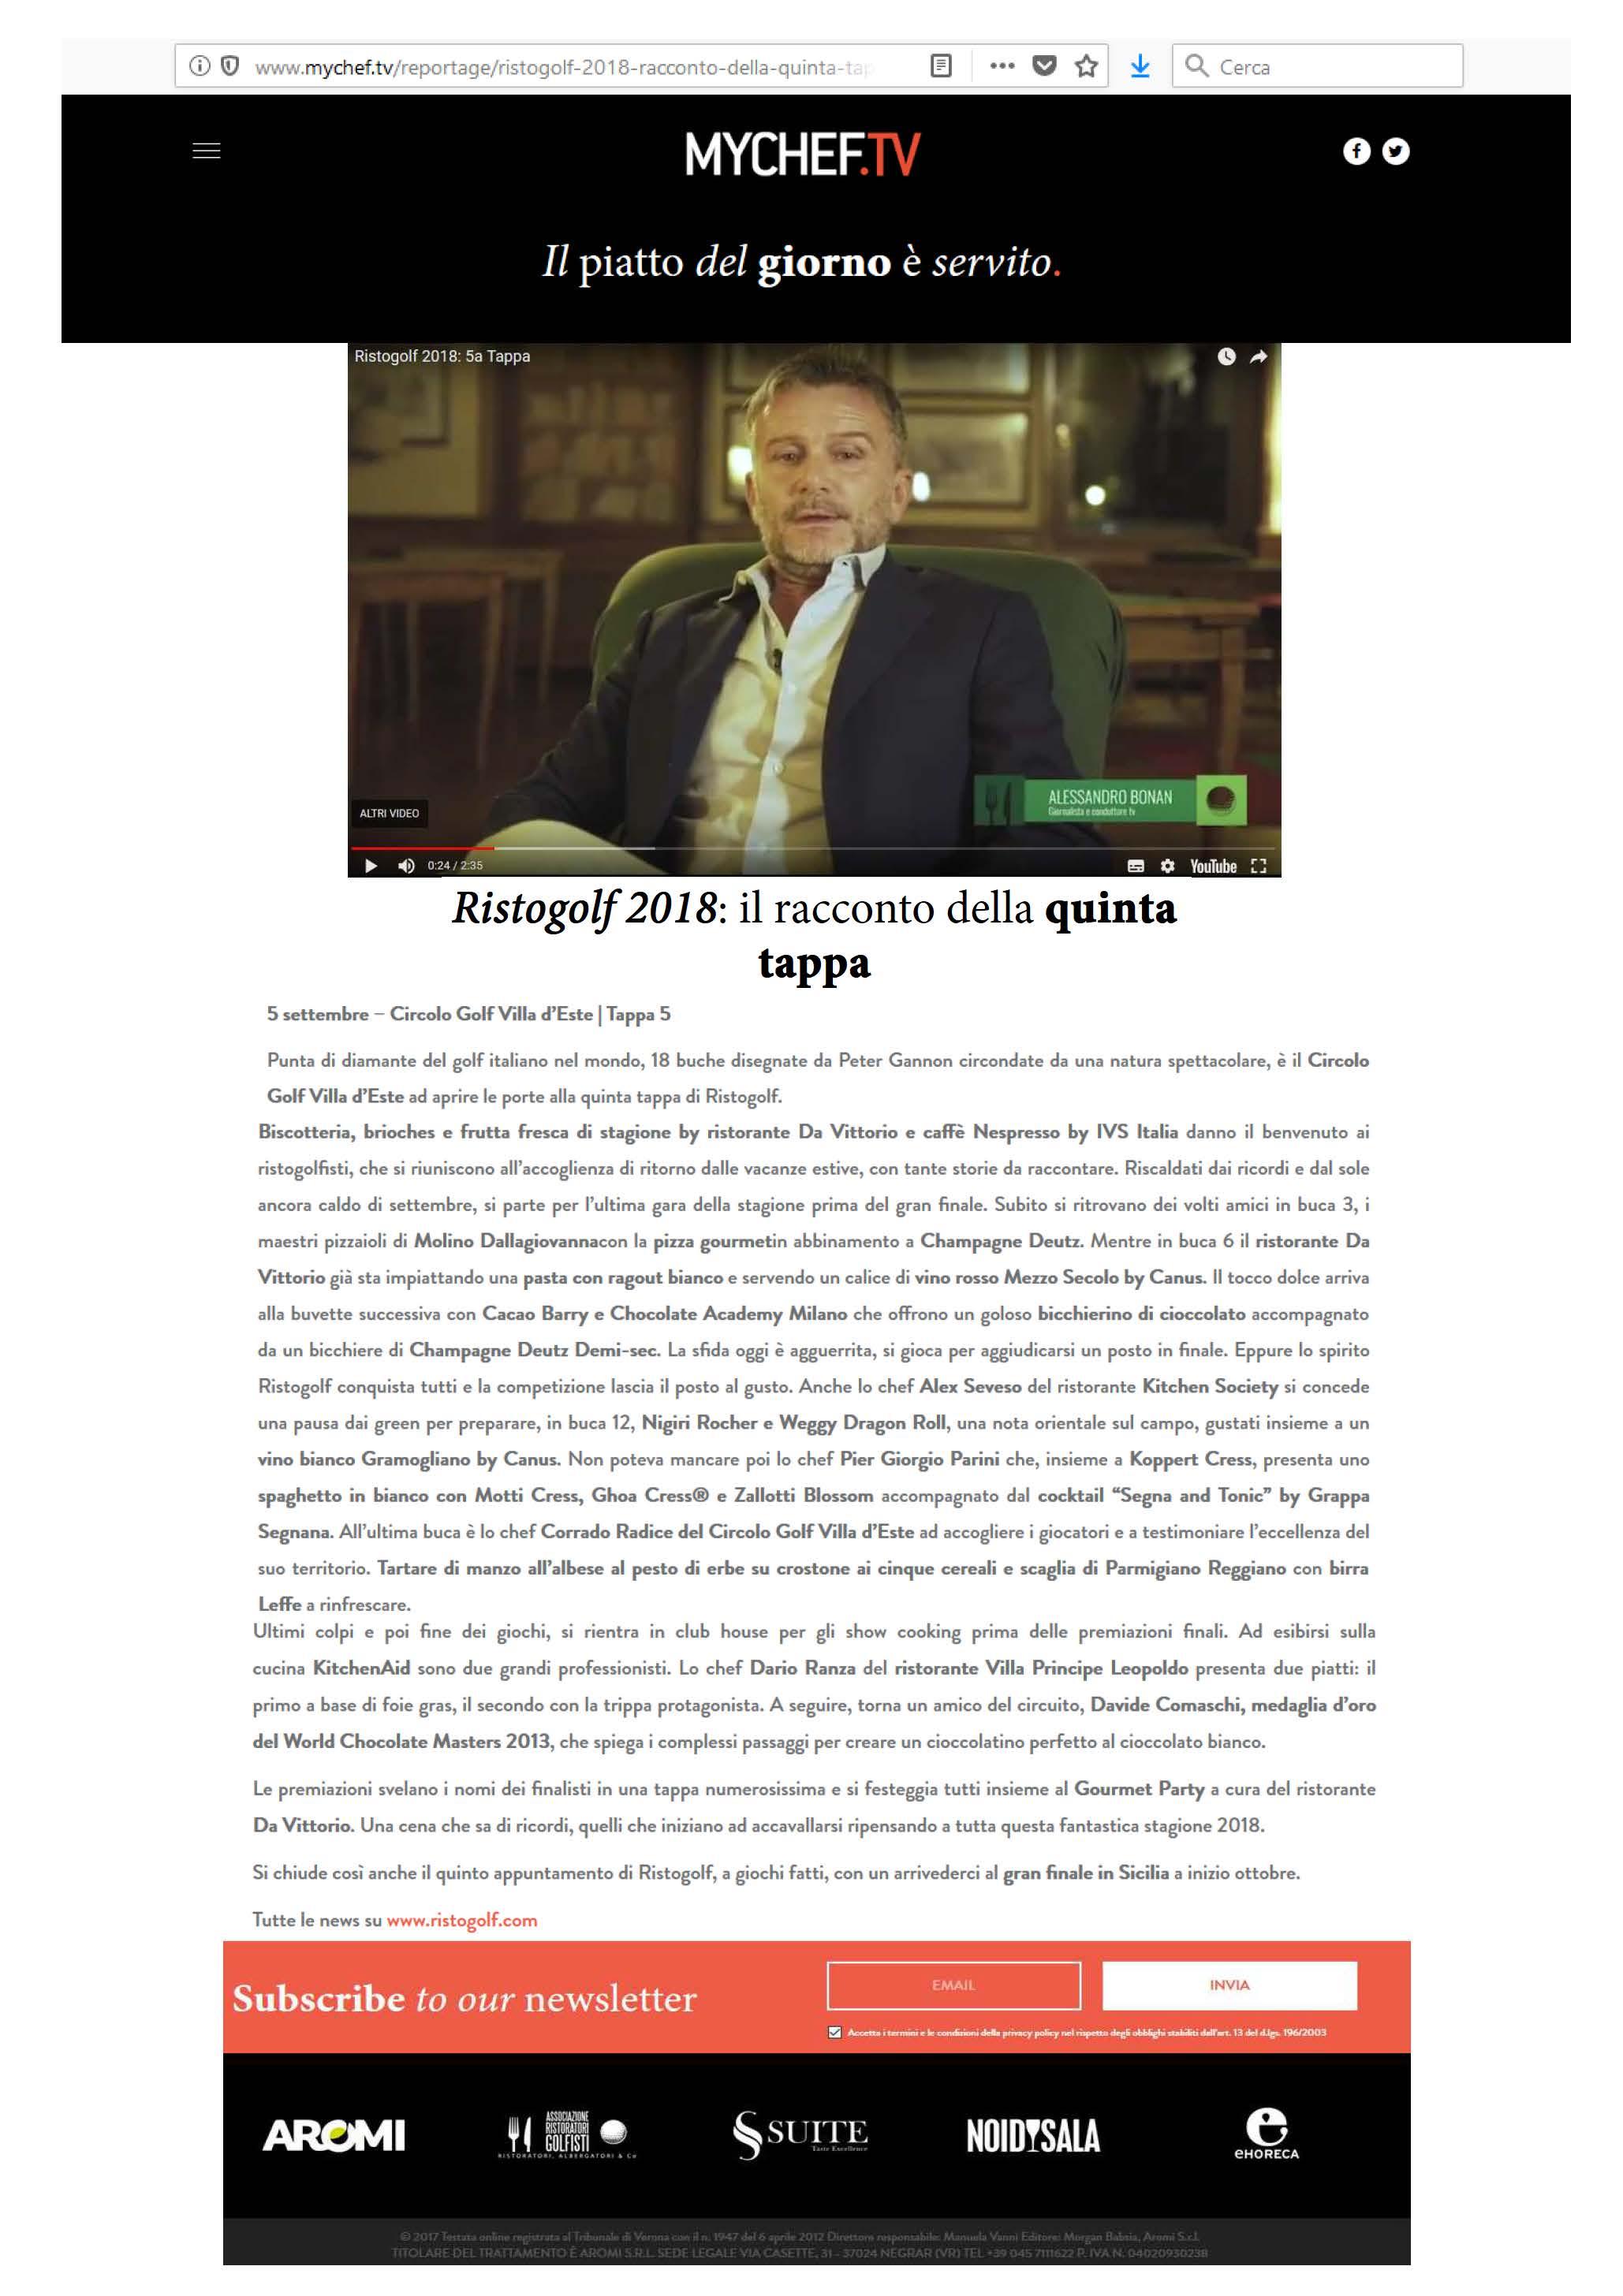 2018.09.17 MyChef.tv